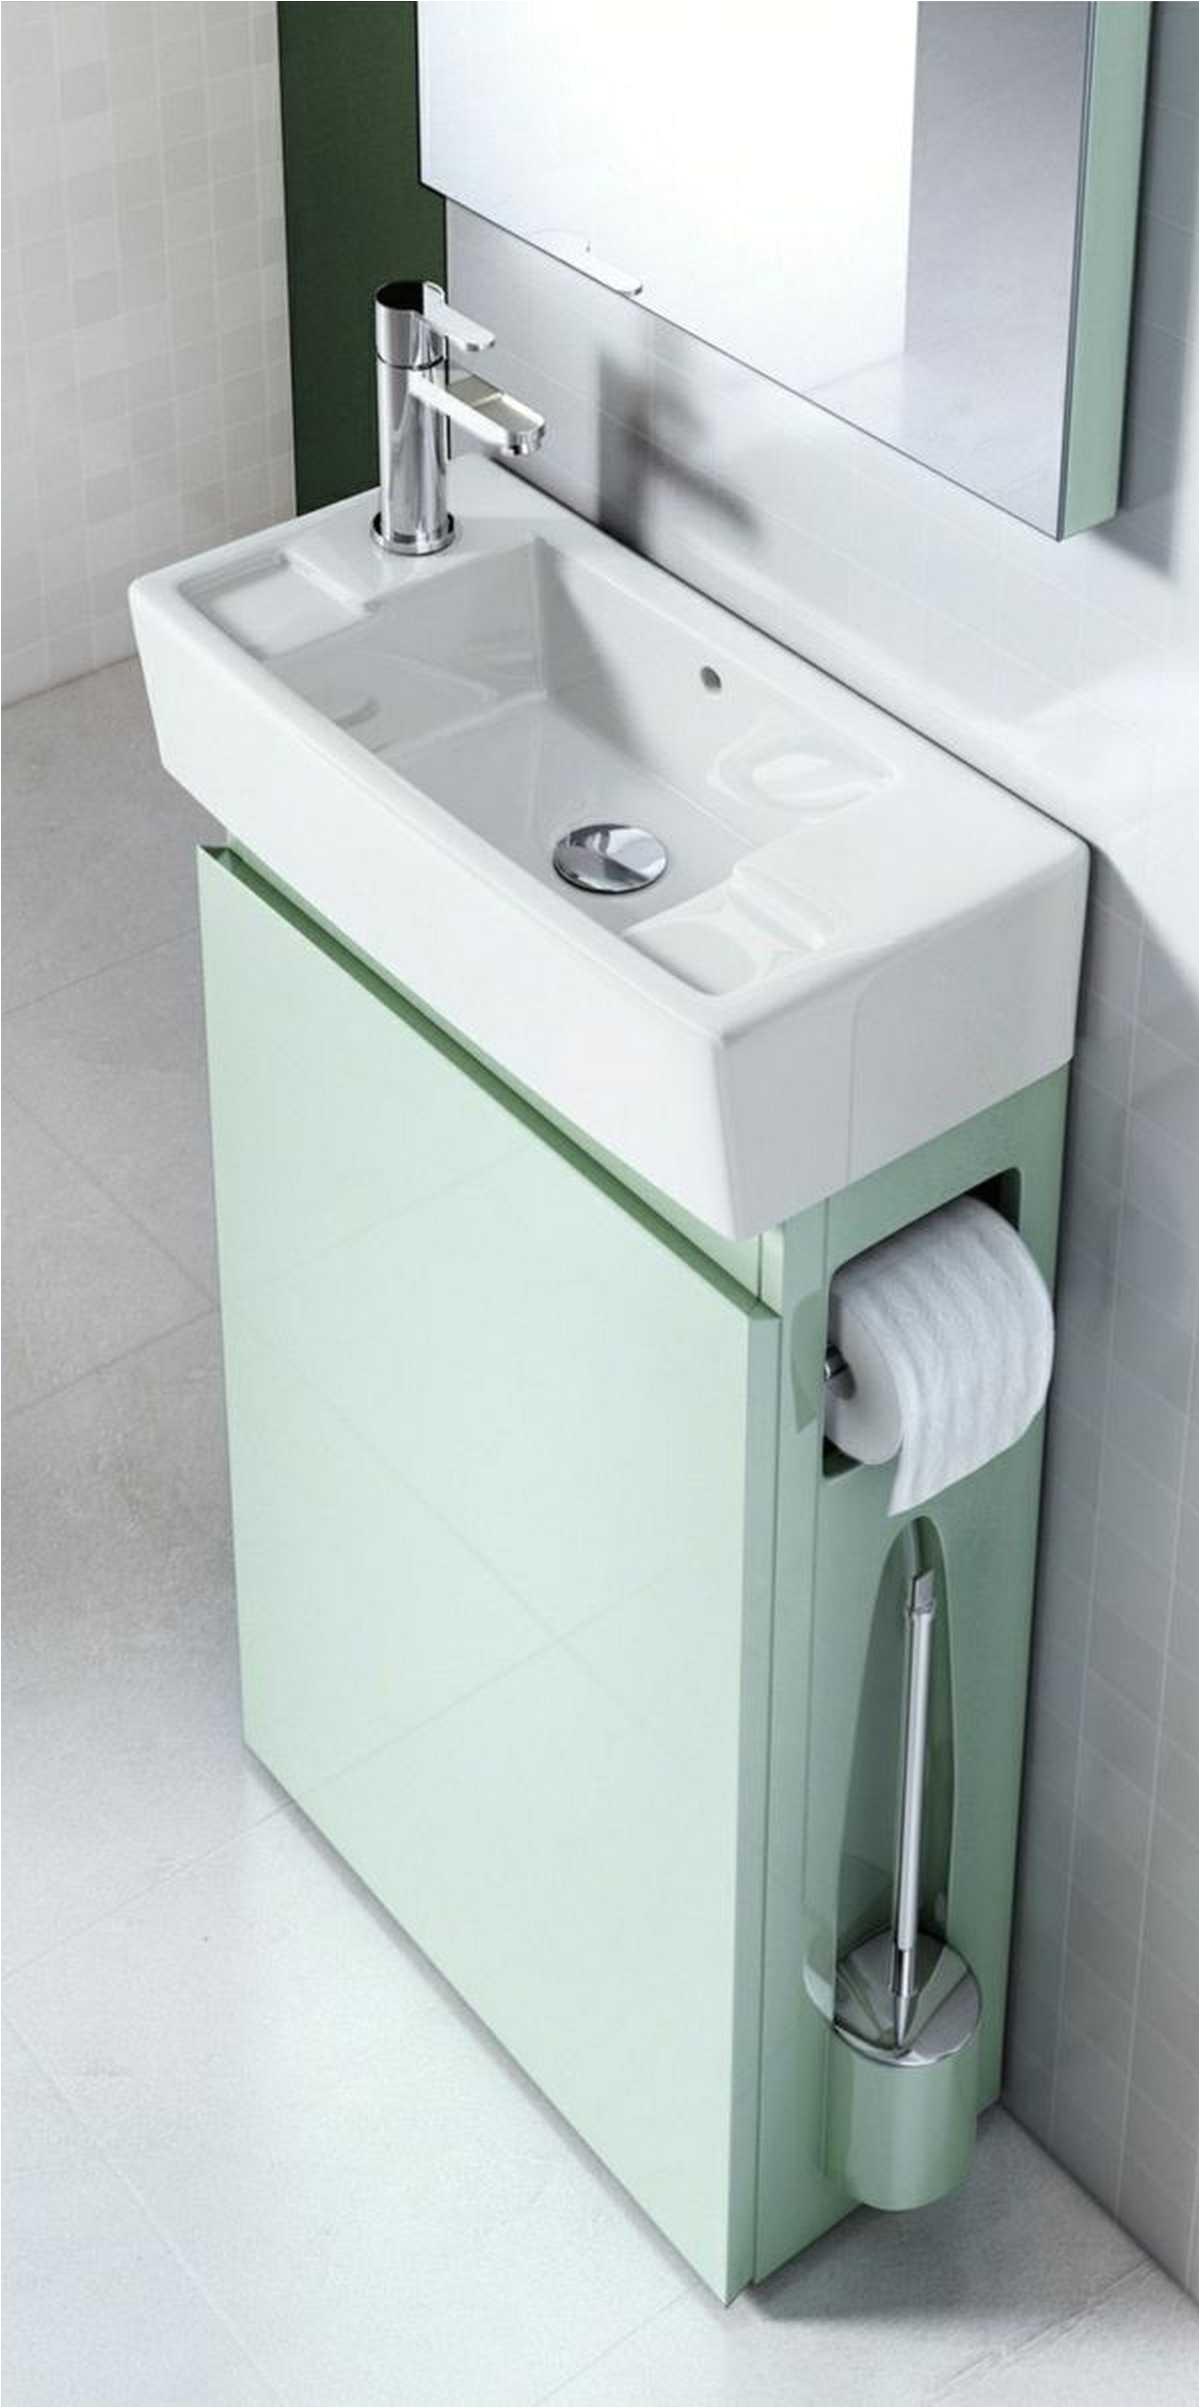 bathroom rustic double sink vanities modern floor tile romantic jacuzzi bathtubs kohler bathtub faucets modern cabinets